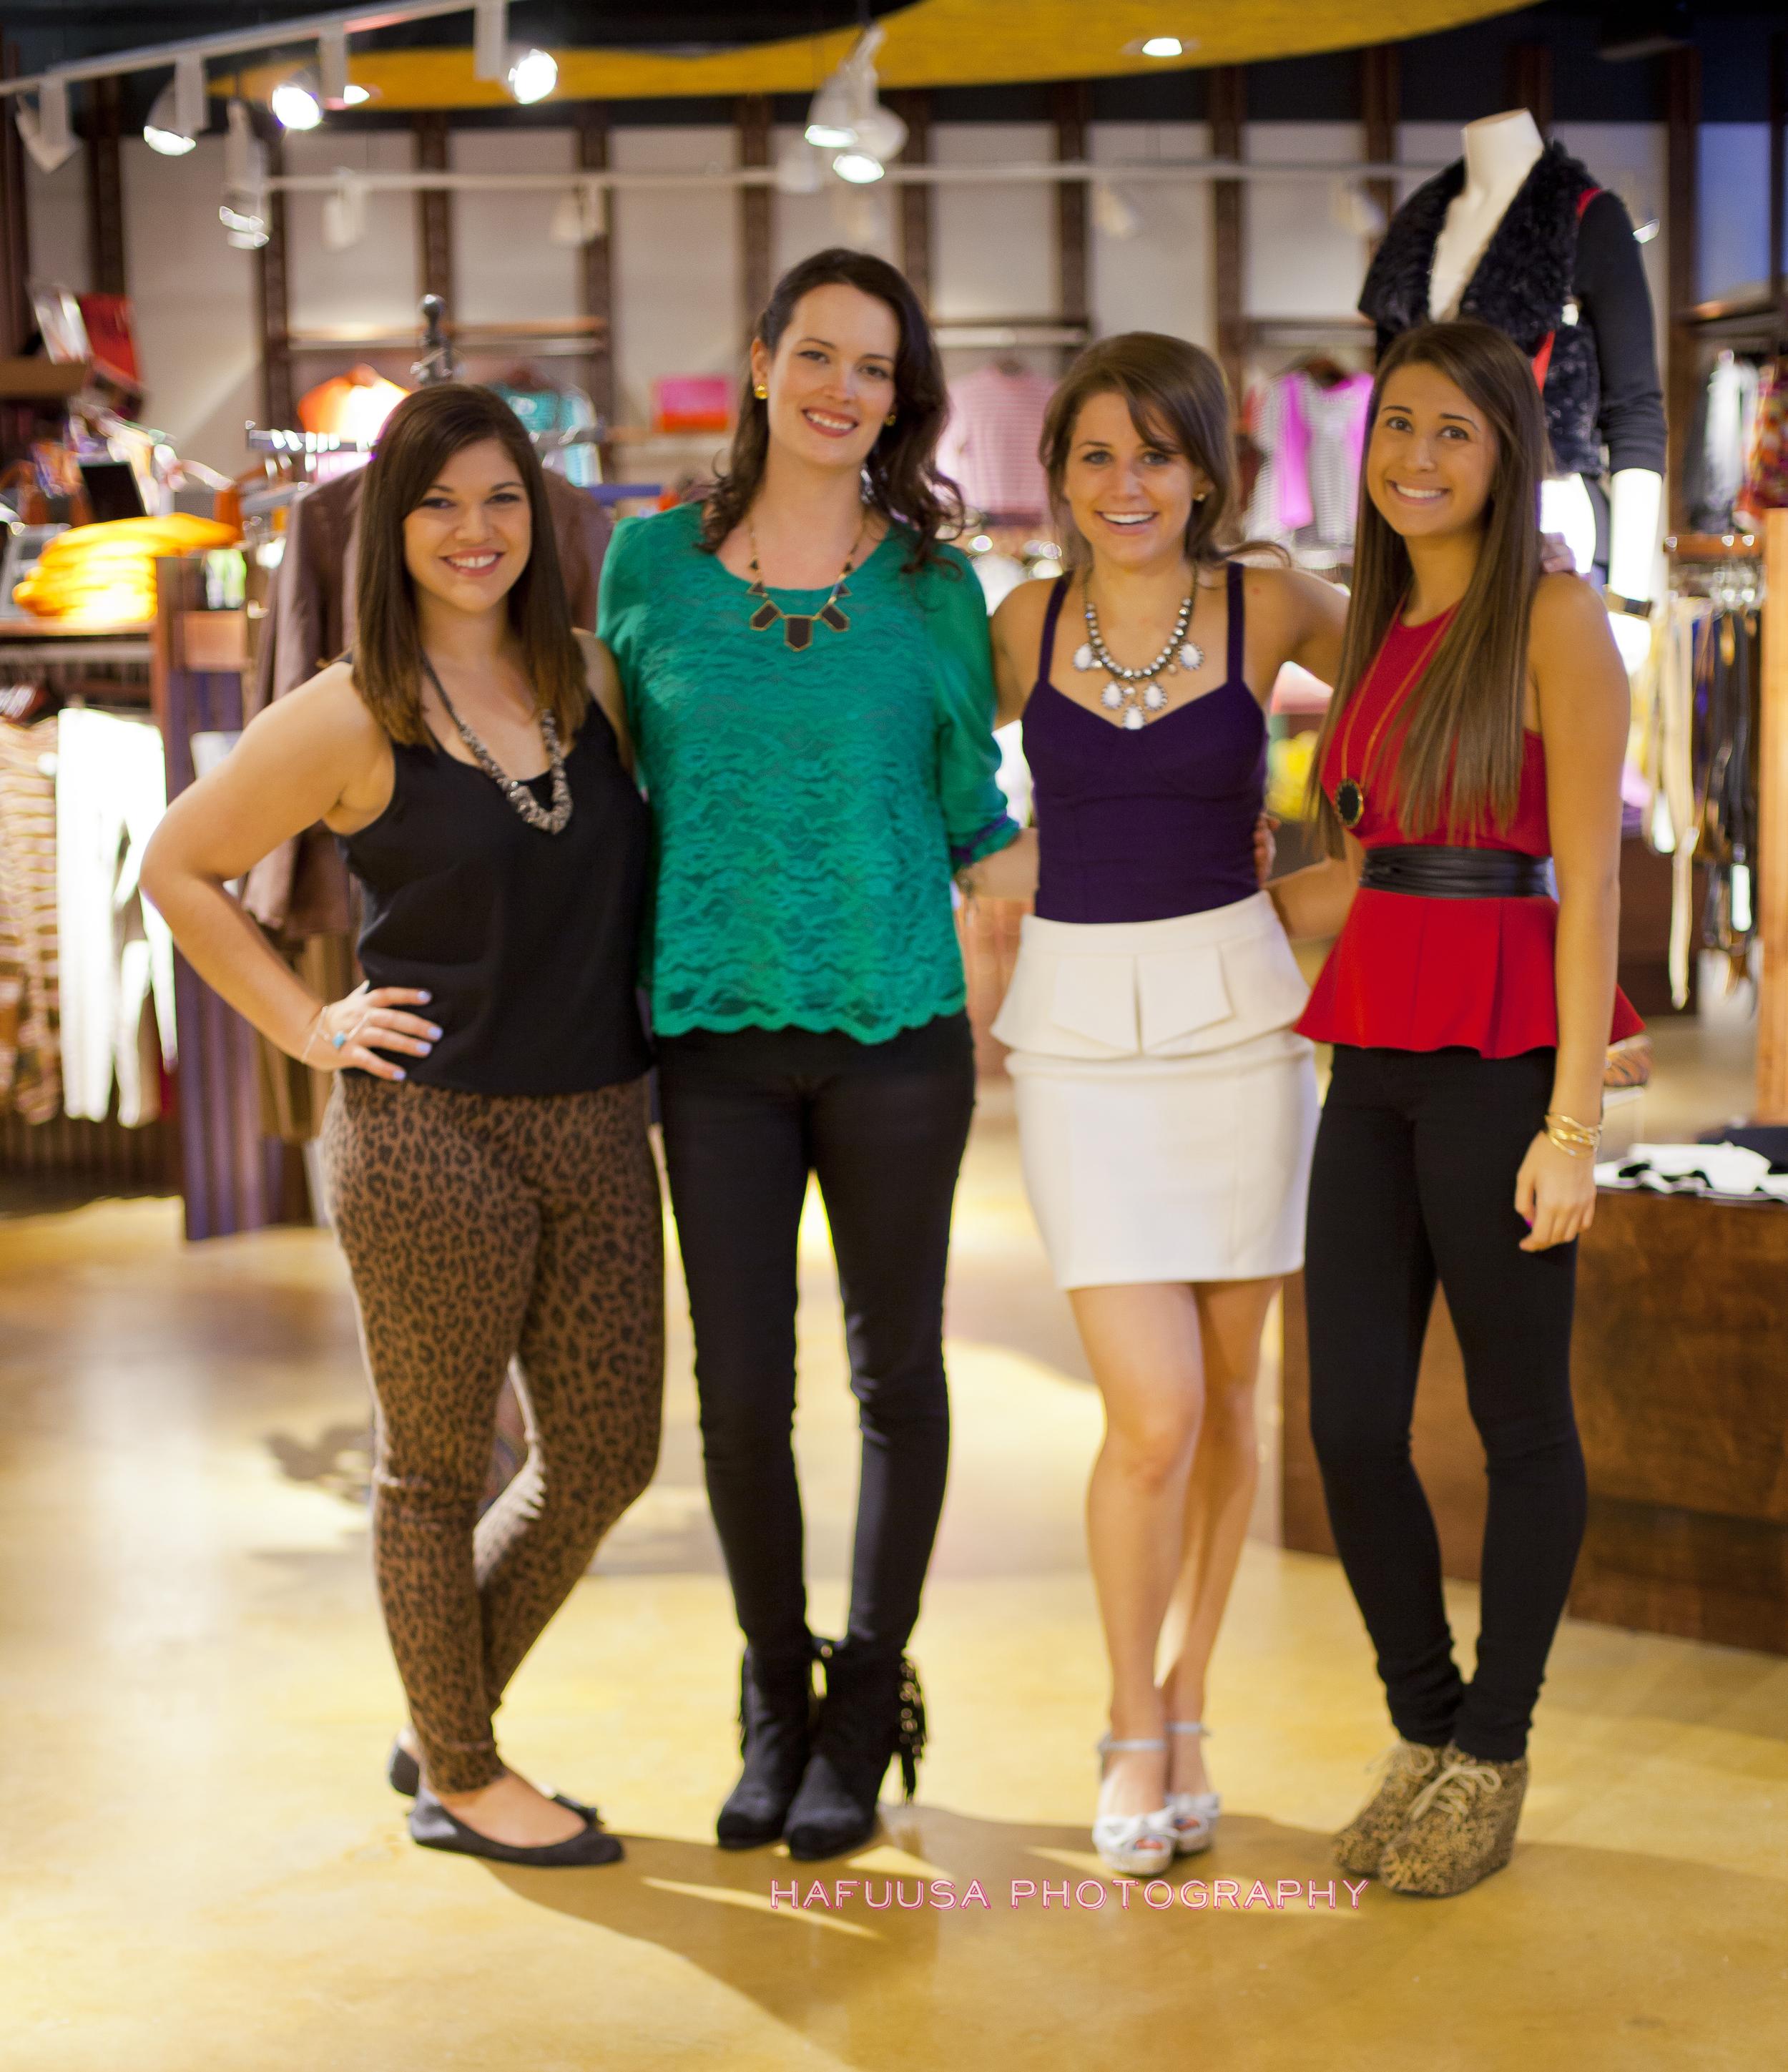 The SMU girls: Renee, Blair, Erica, and Gamze